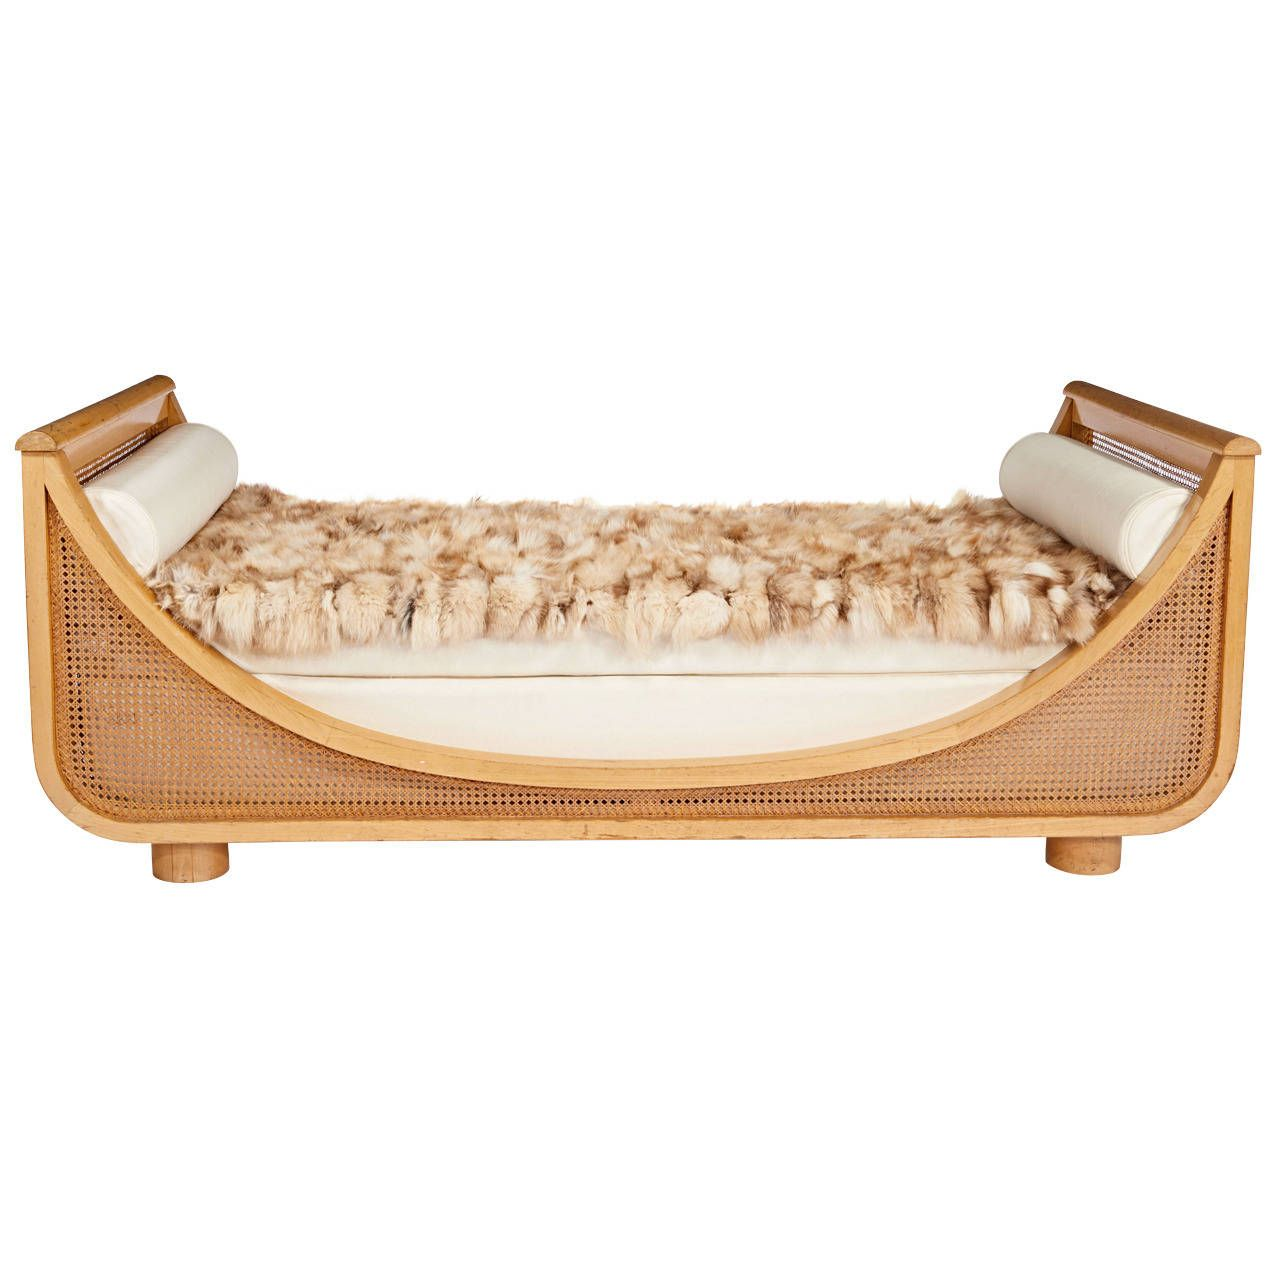 "Jean Royère ""Gondola"" Daybed in 2020 Unique bed design"